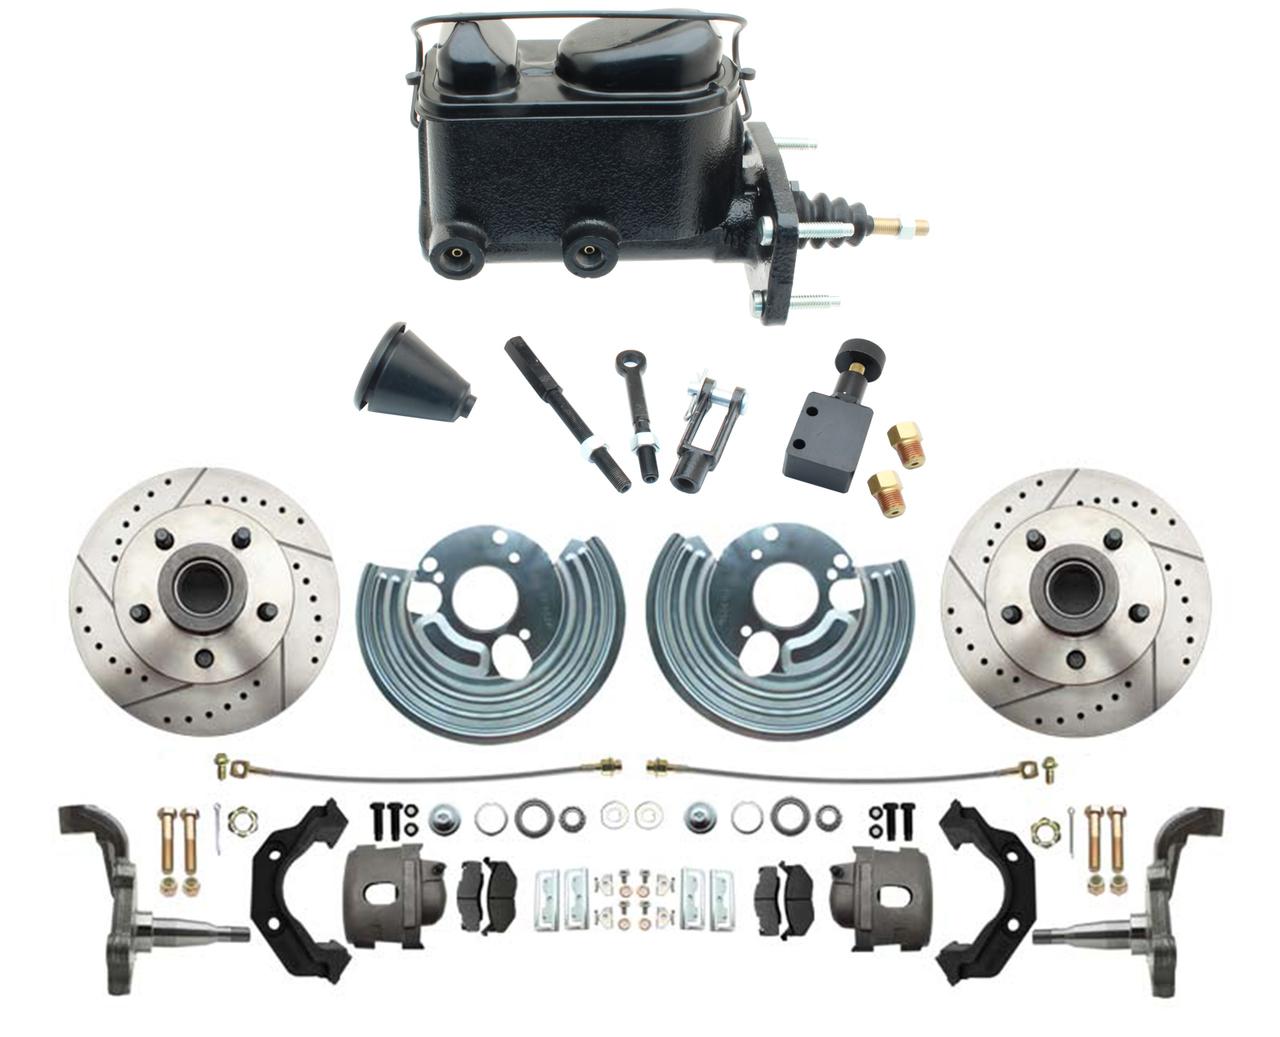 1962-72 Mopar B & E Body Standard Manual Master Front Disc Brake Conversion Kit W/ Drilled/ Slotted Rotors